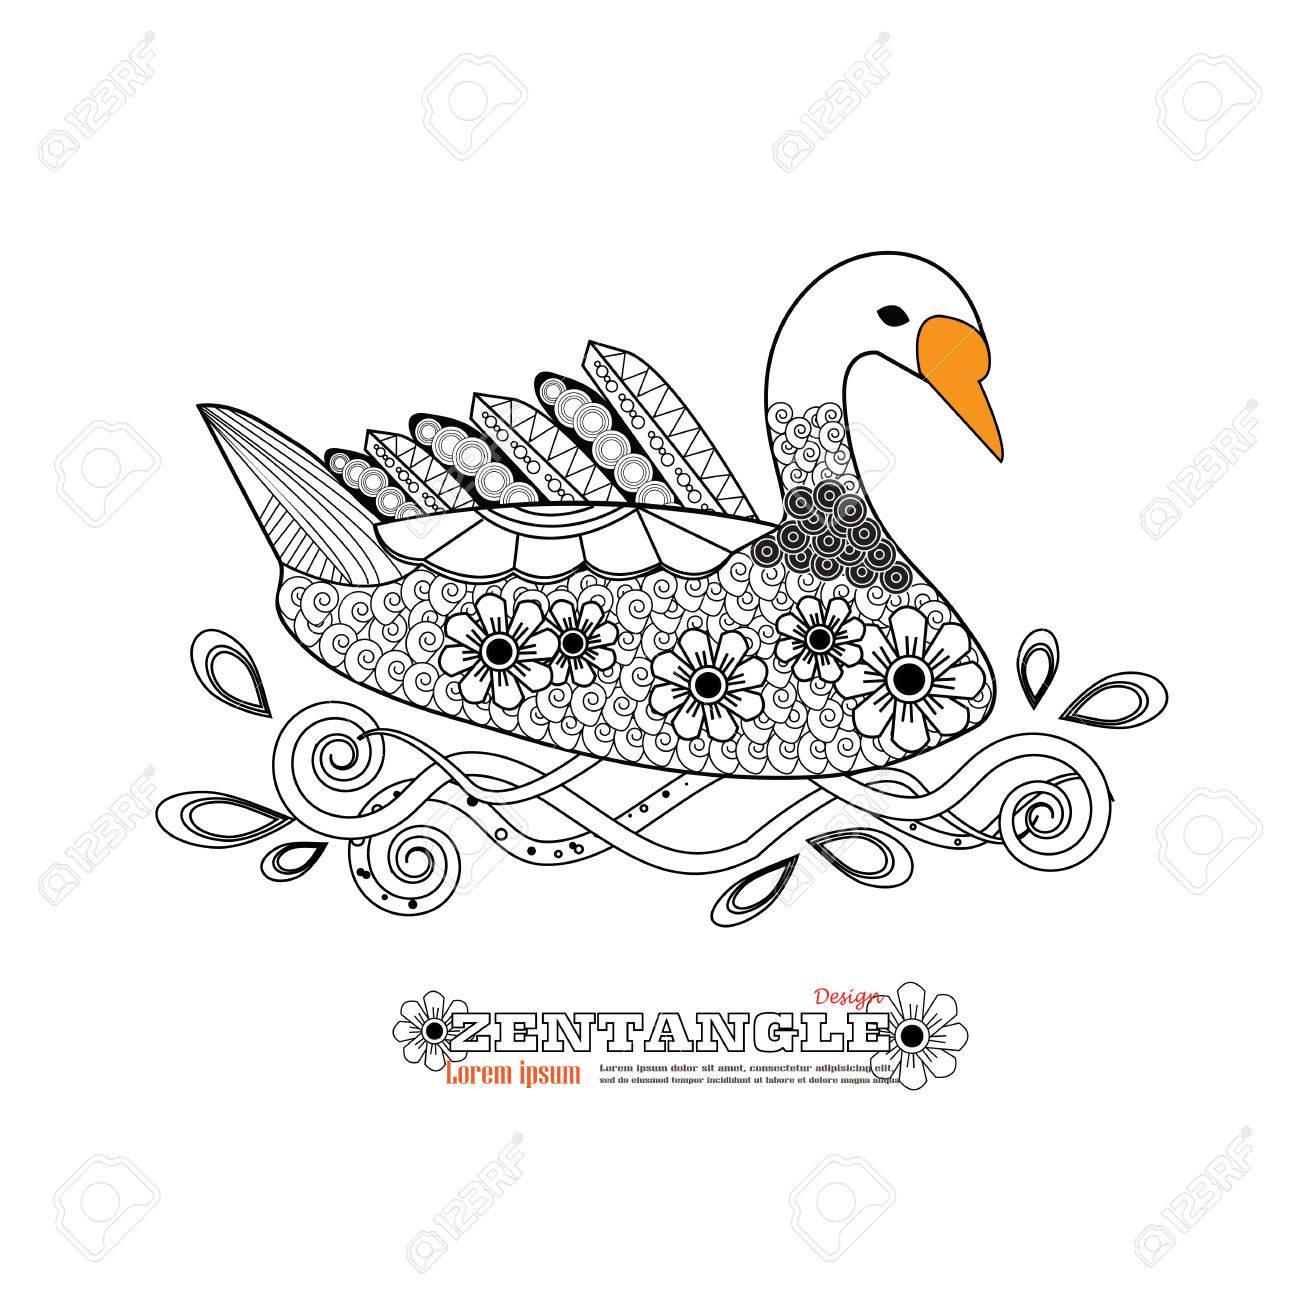 Hand Drawing Artistic Swan.zentangle Tribal Style, Ethnic Ornamental ...